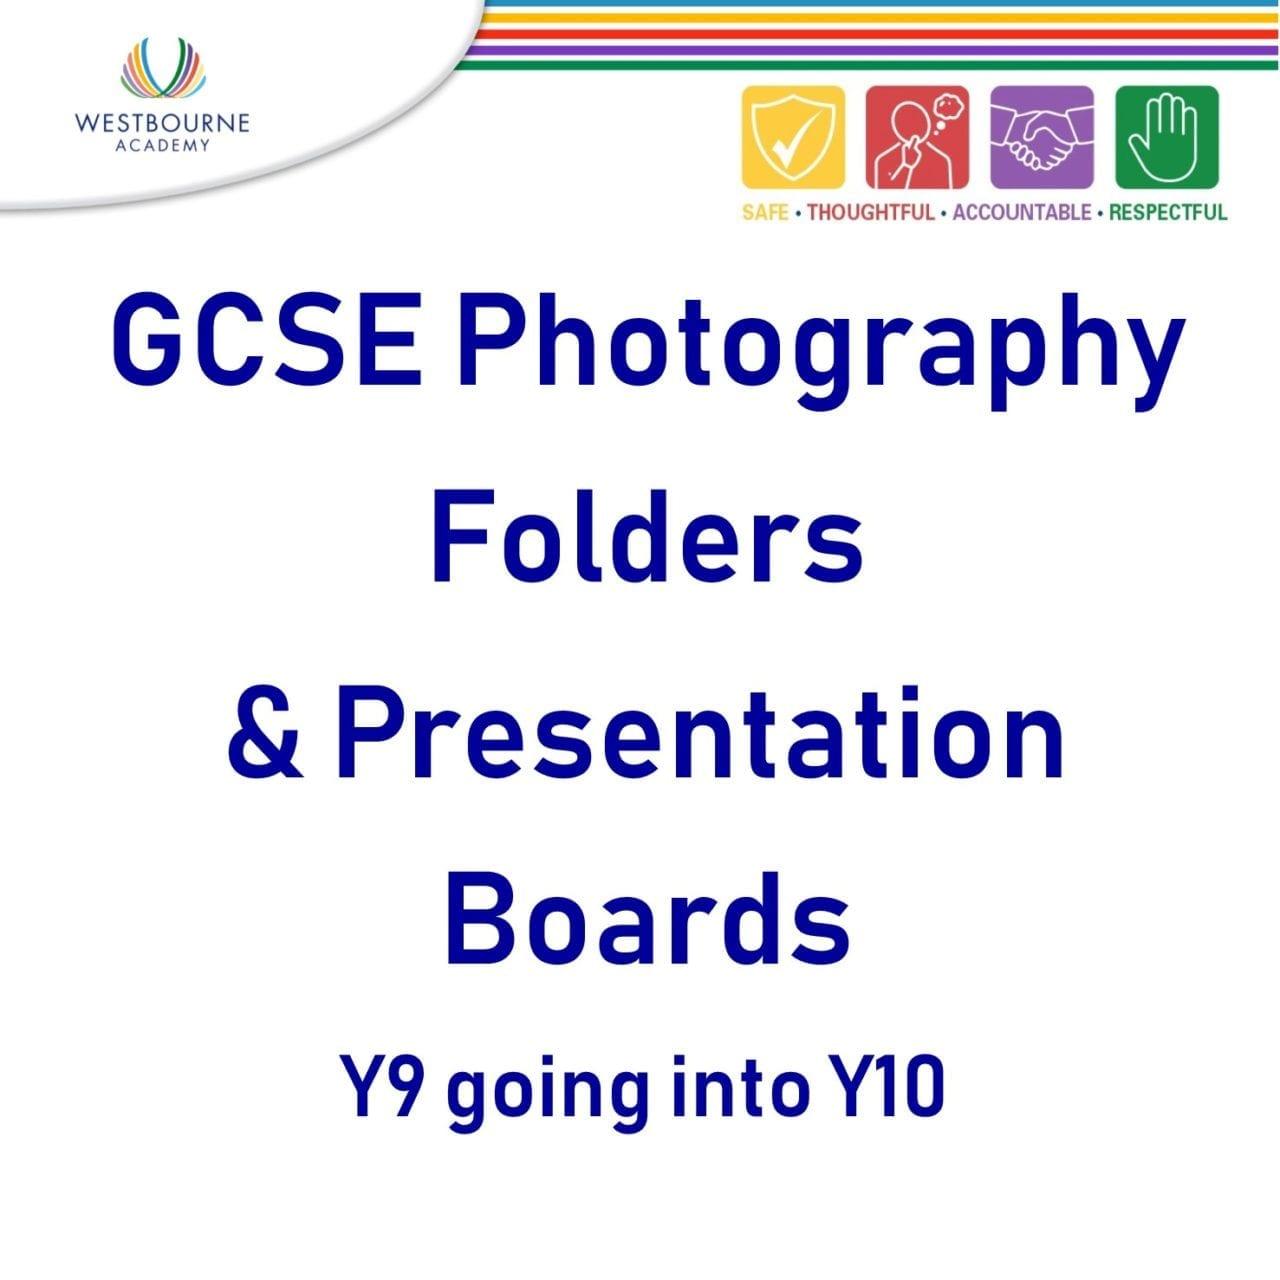 GCSE Photography Folders